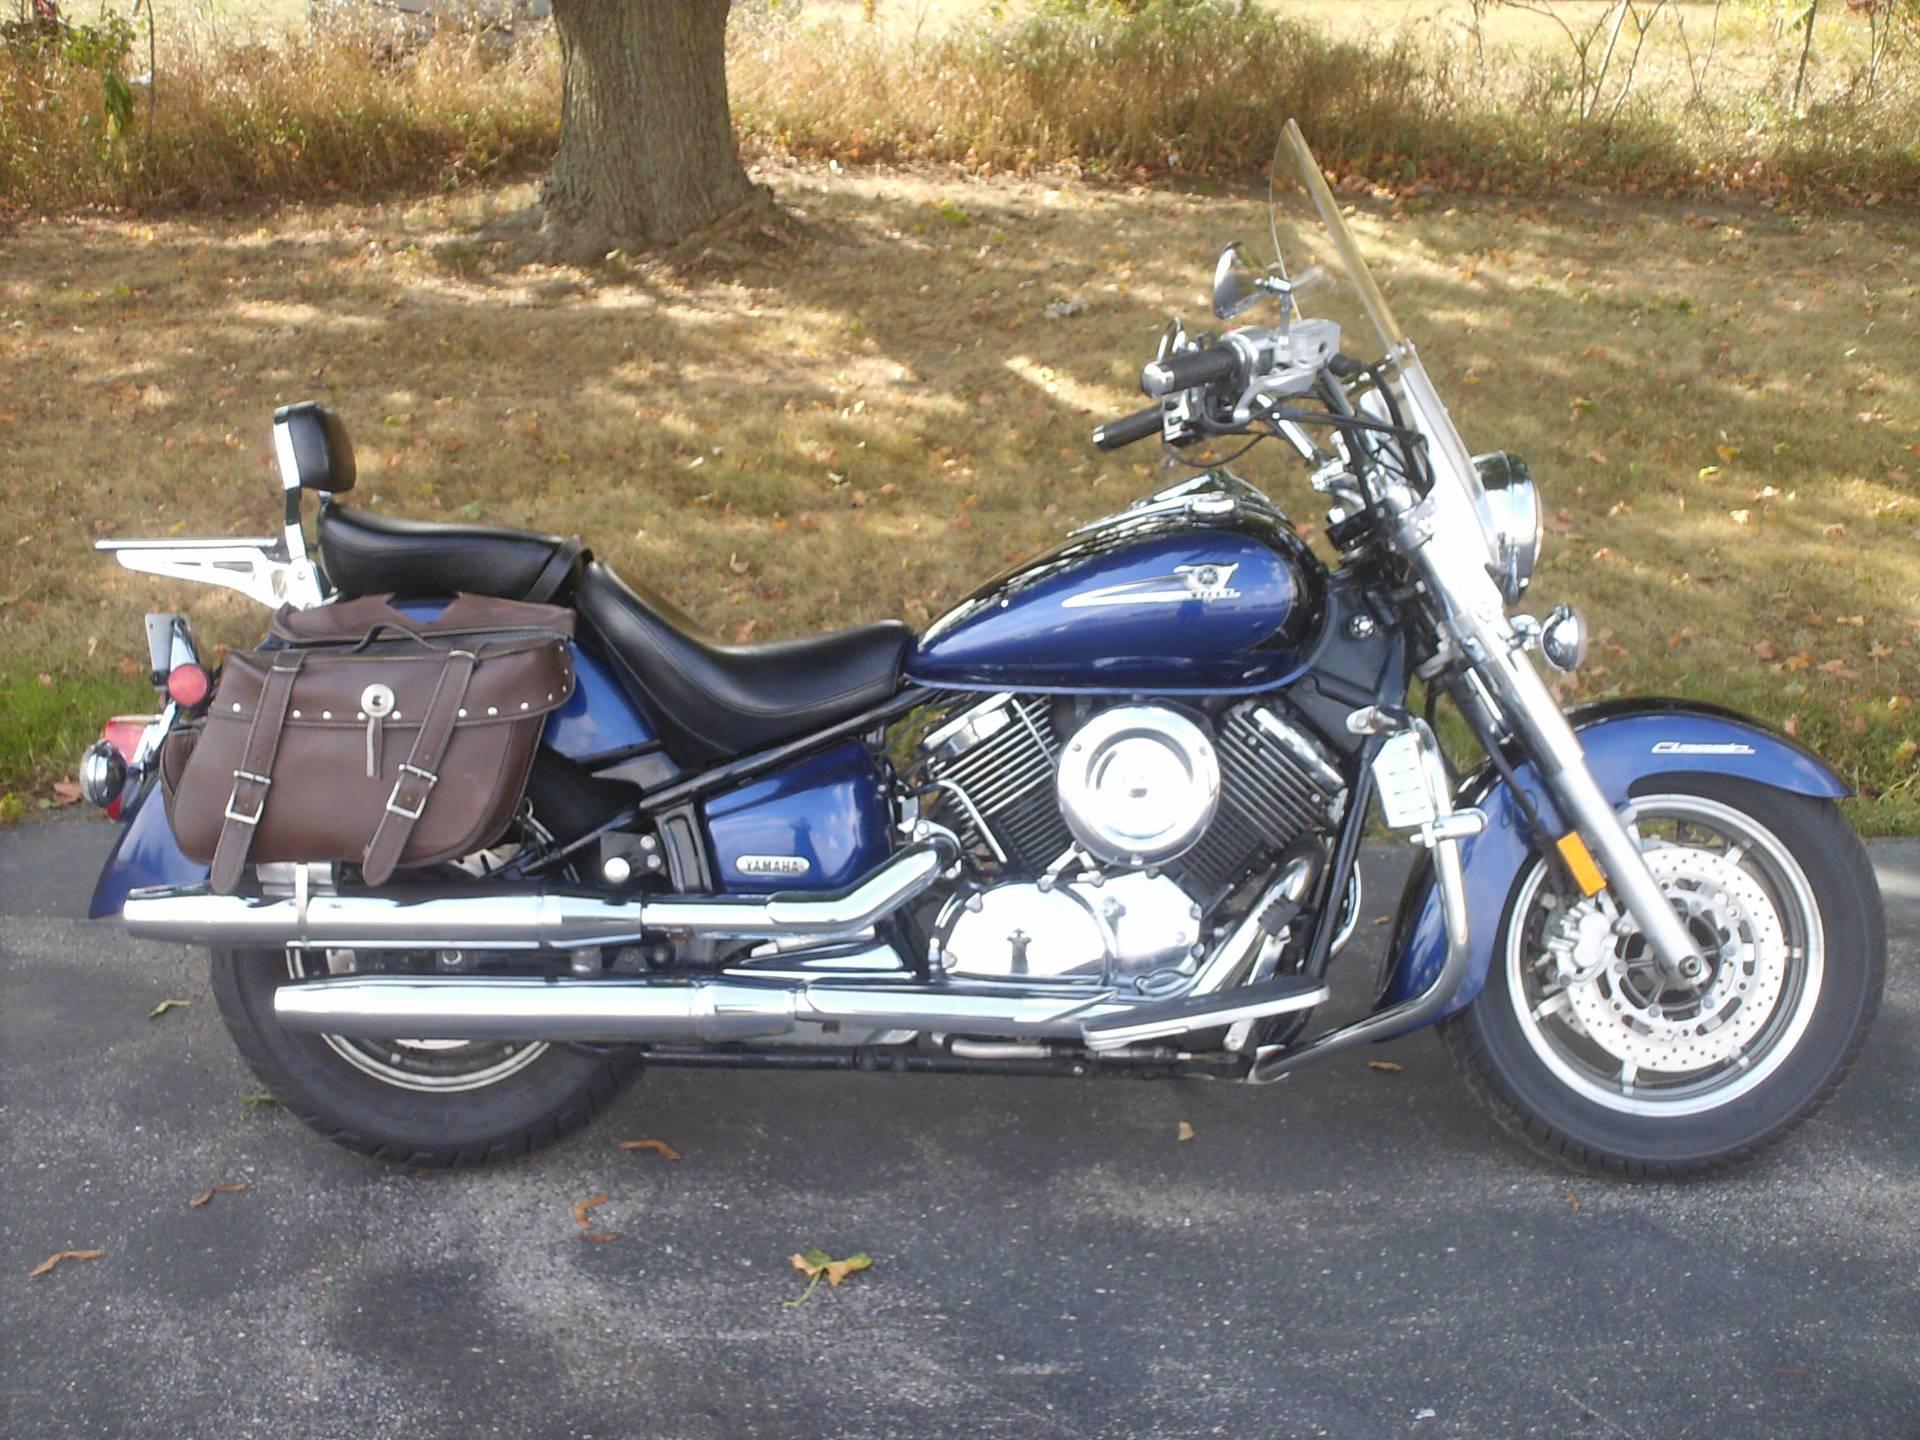 2005 yamaha v star 1100 classic for sale for Yamaha v star classic